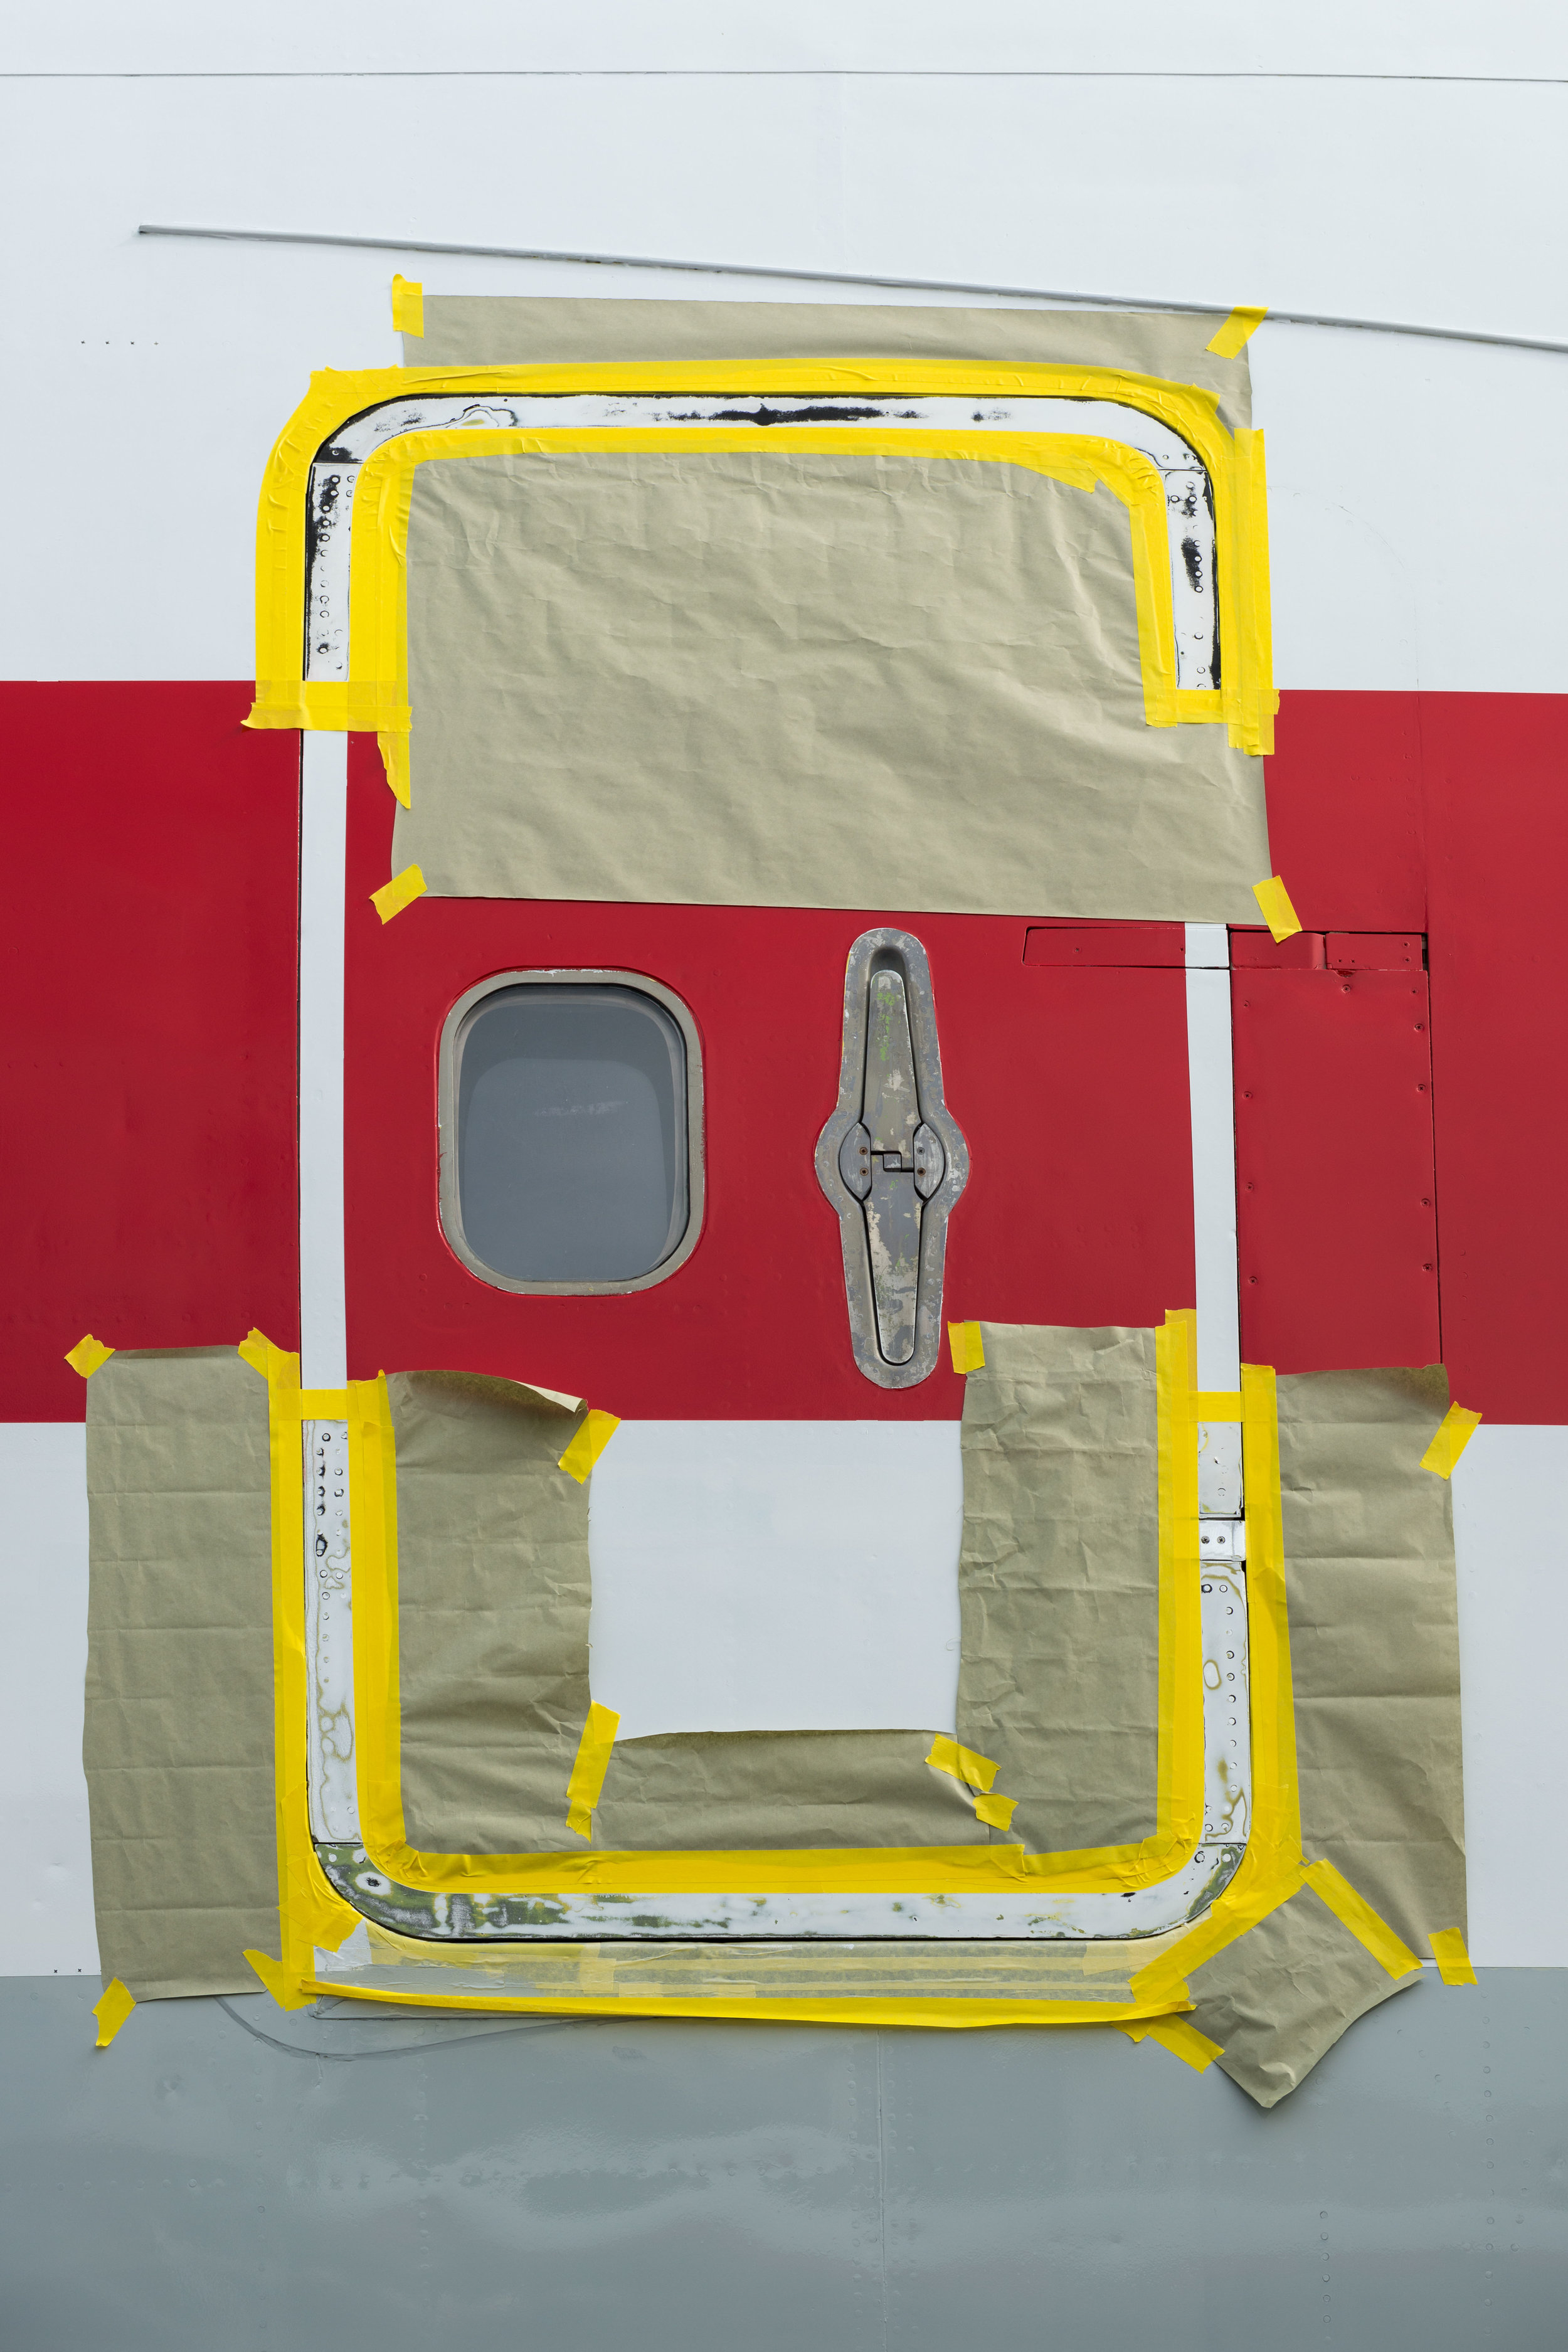 RA001 - the first Jumbo Jet